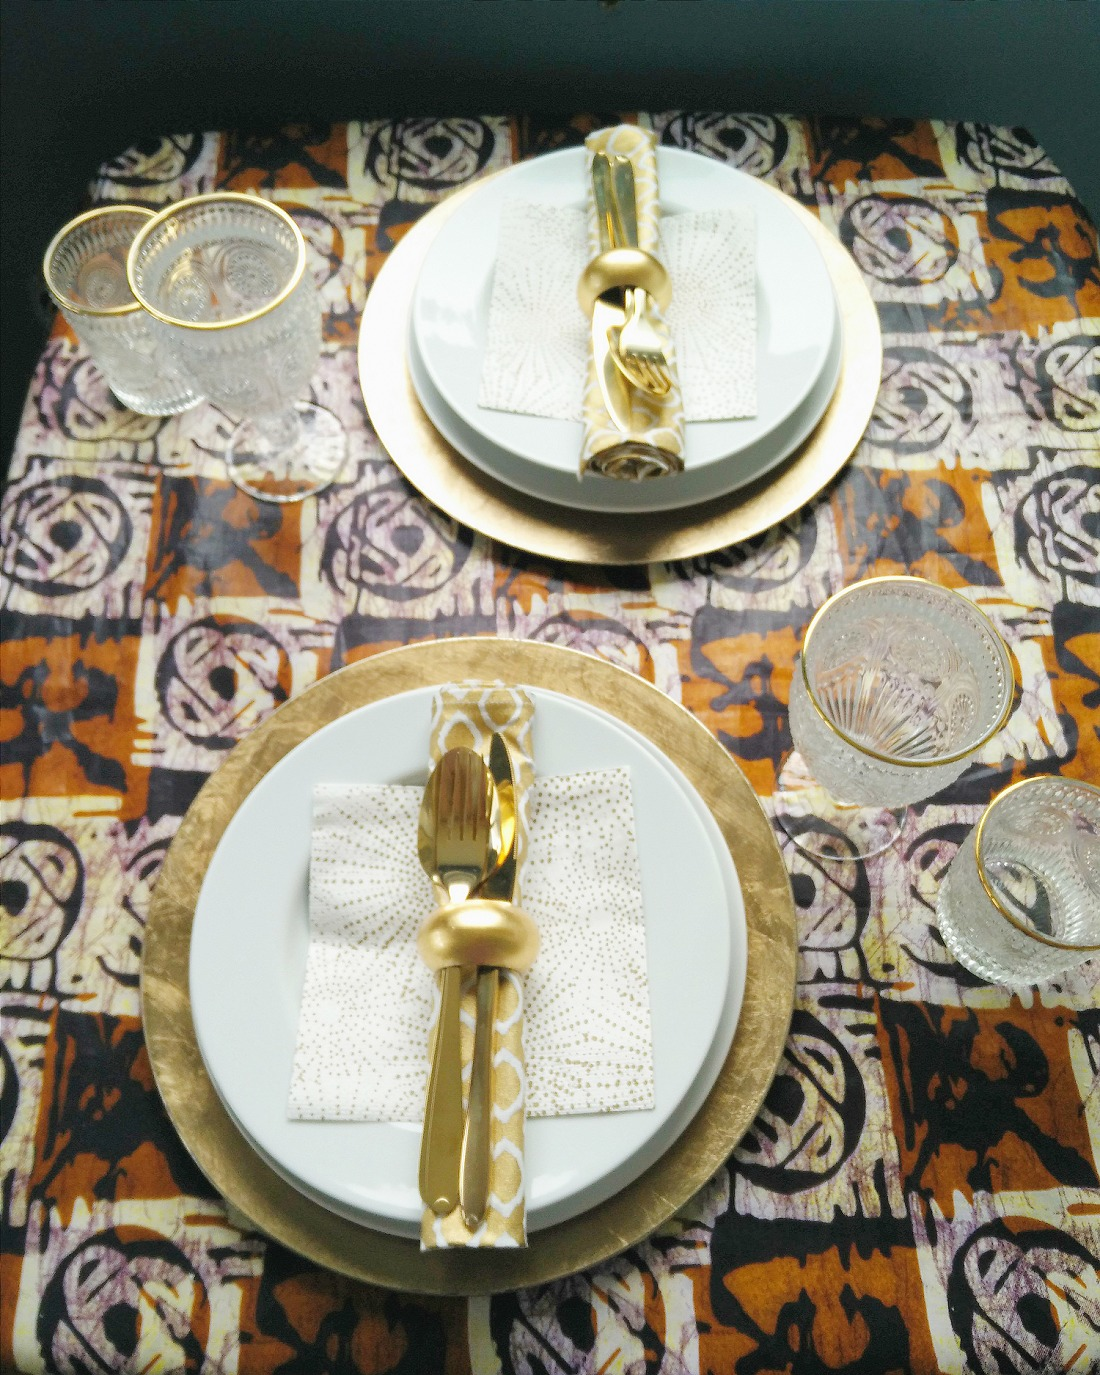 xmas table laid with brown and cream ankara fabric